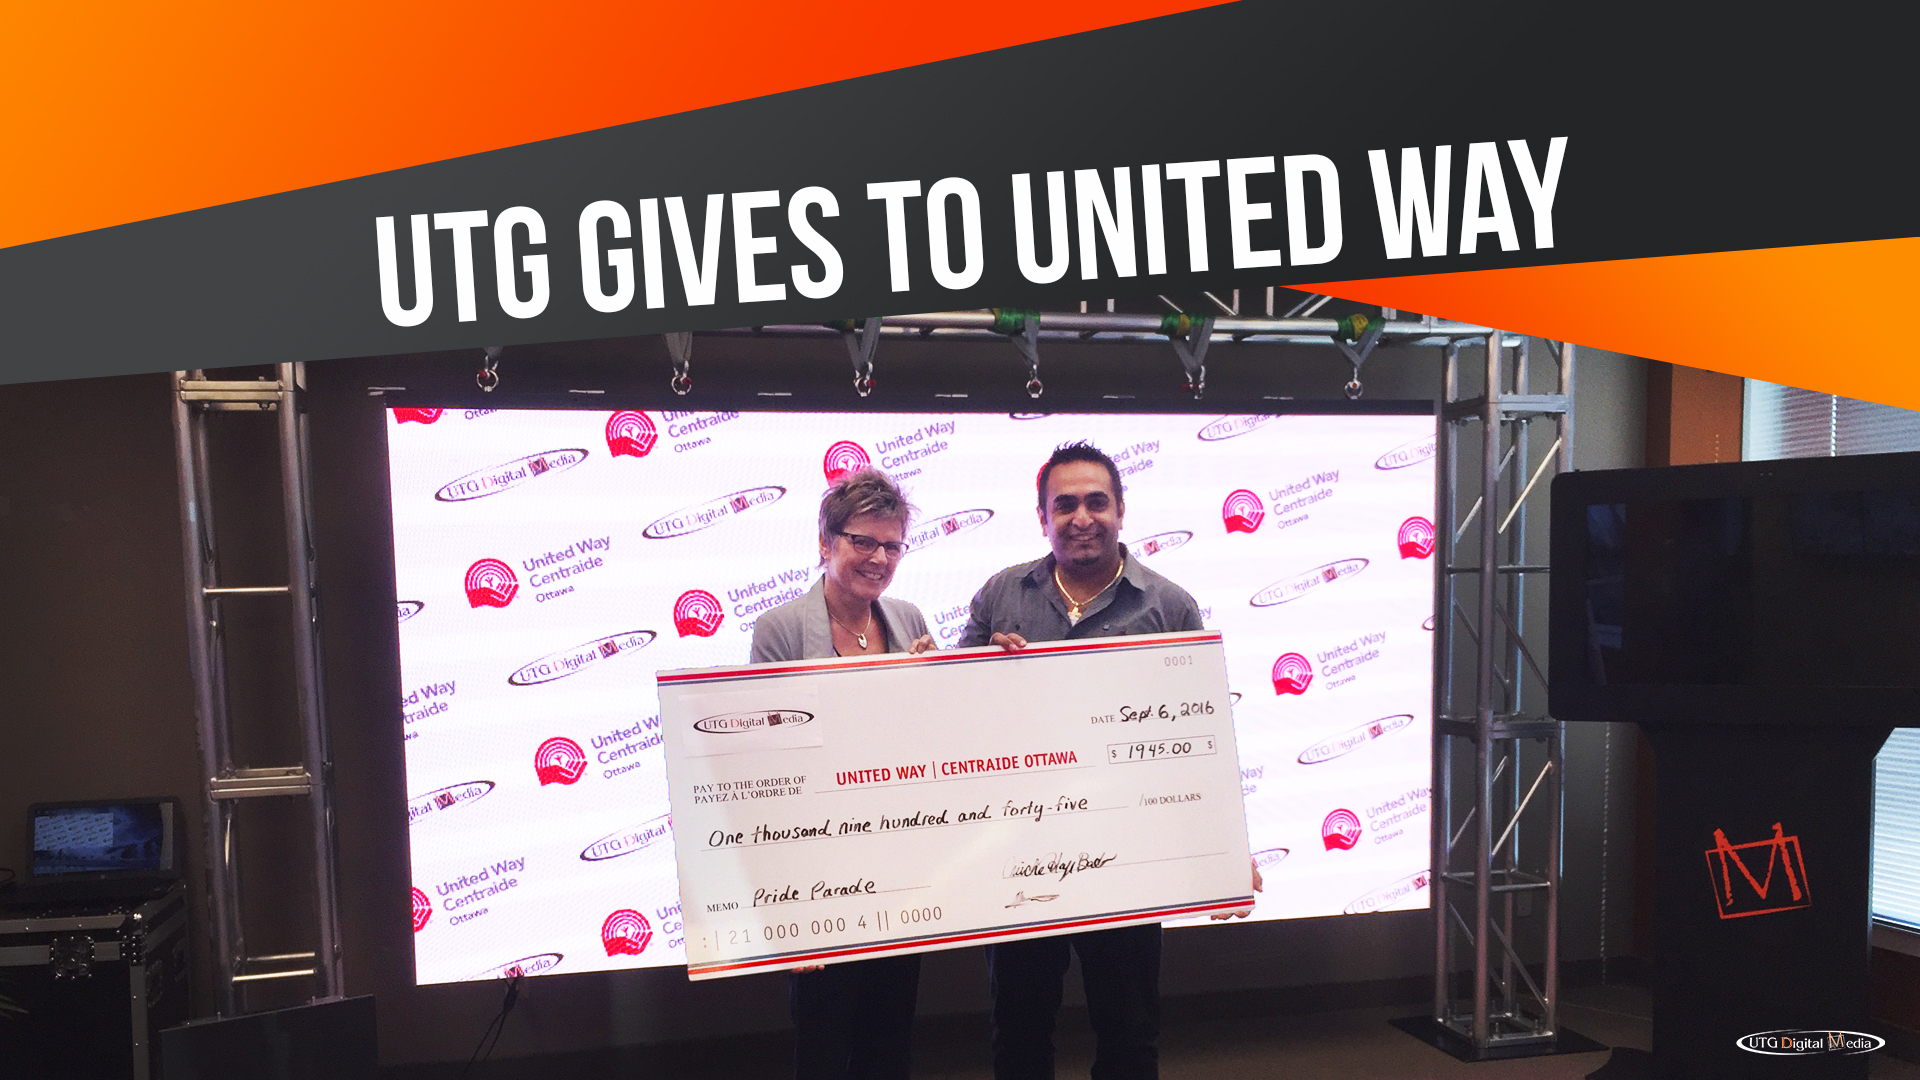 UTG Digital Media Supports United Way Ottawa